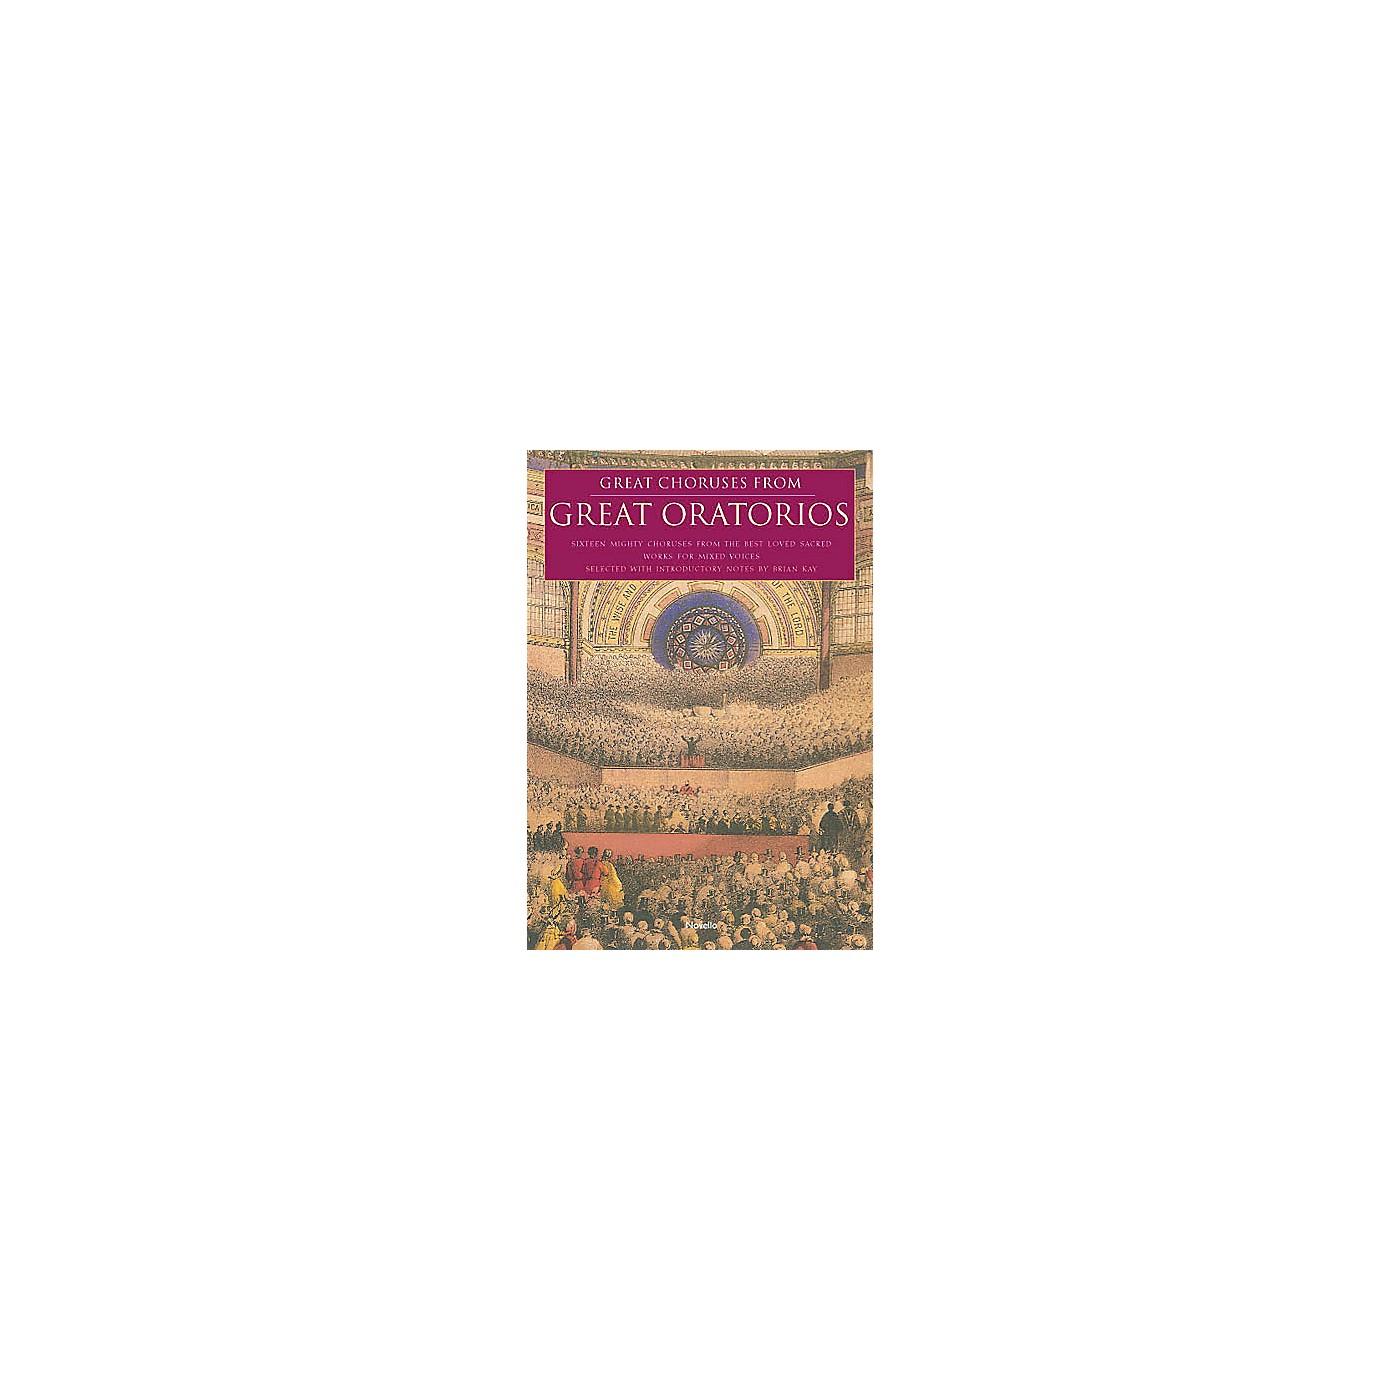 Novello Great Choruses from Great Oratorios SATB thumbnail